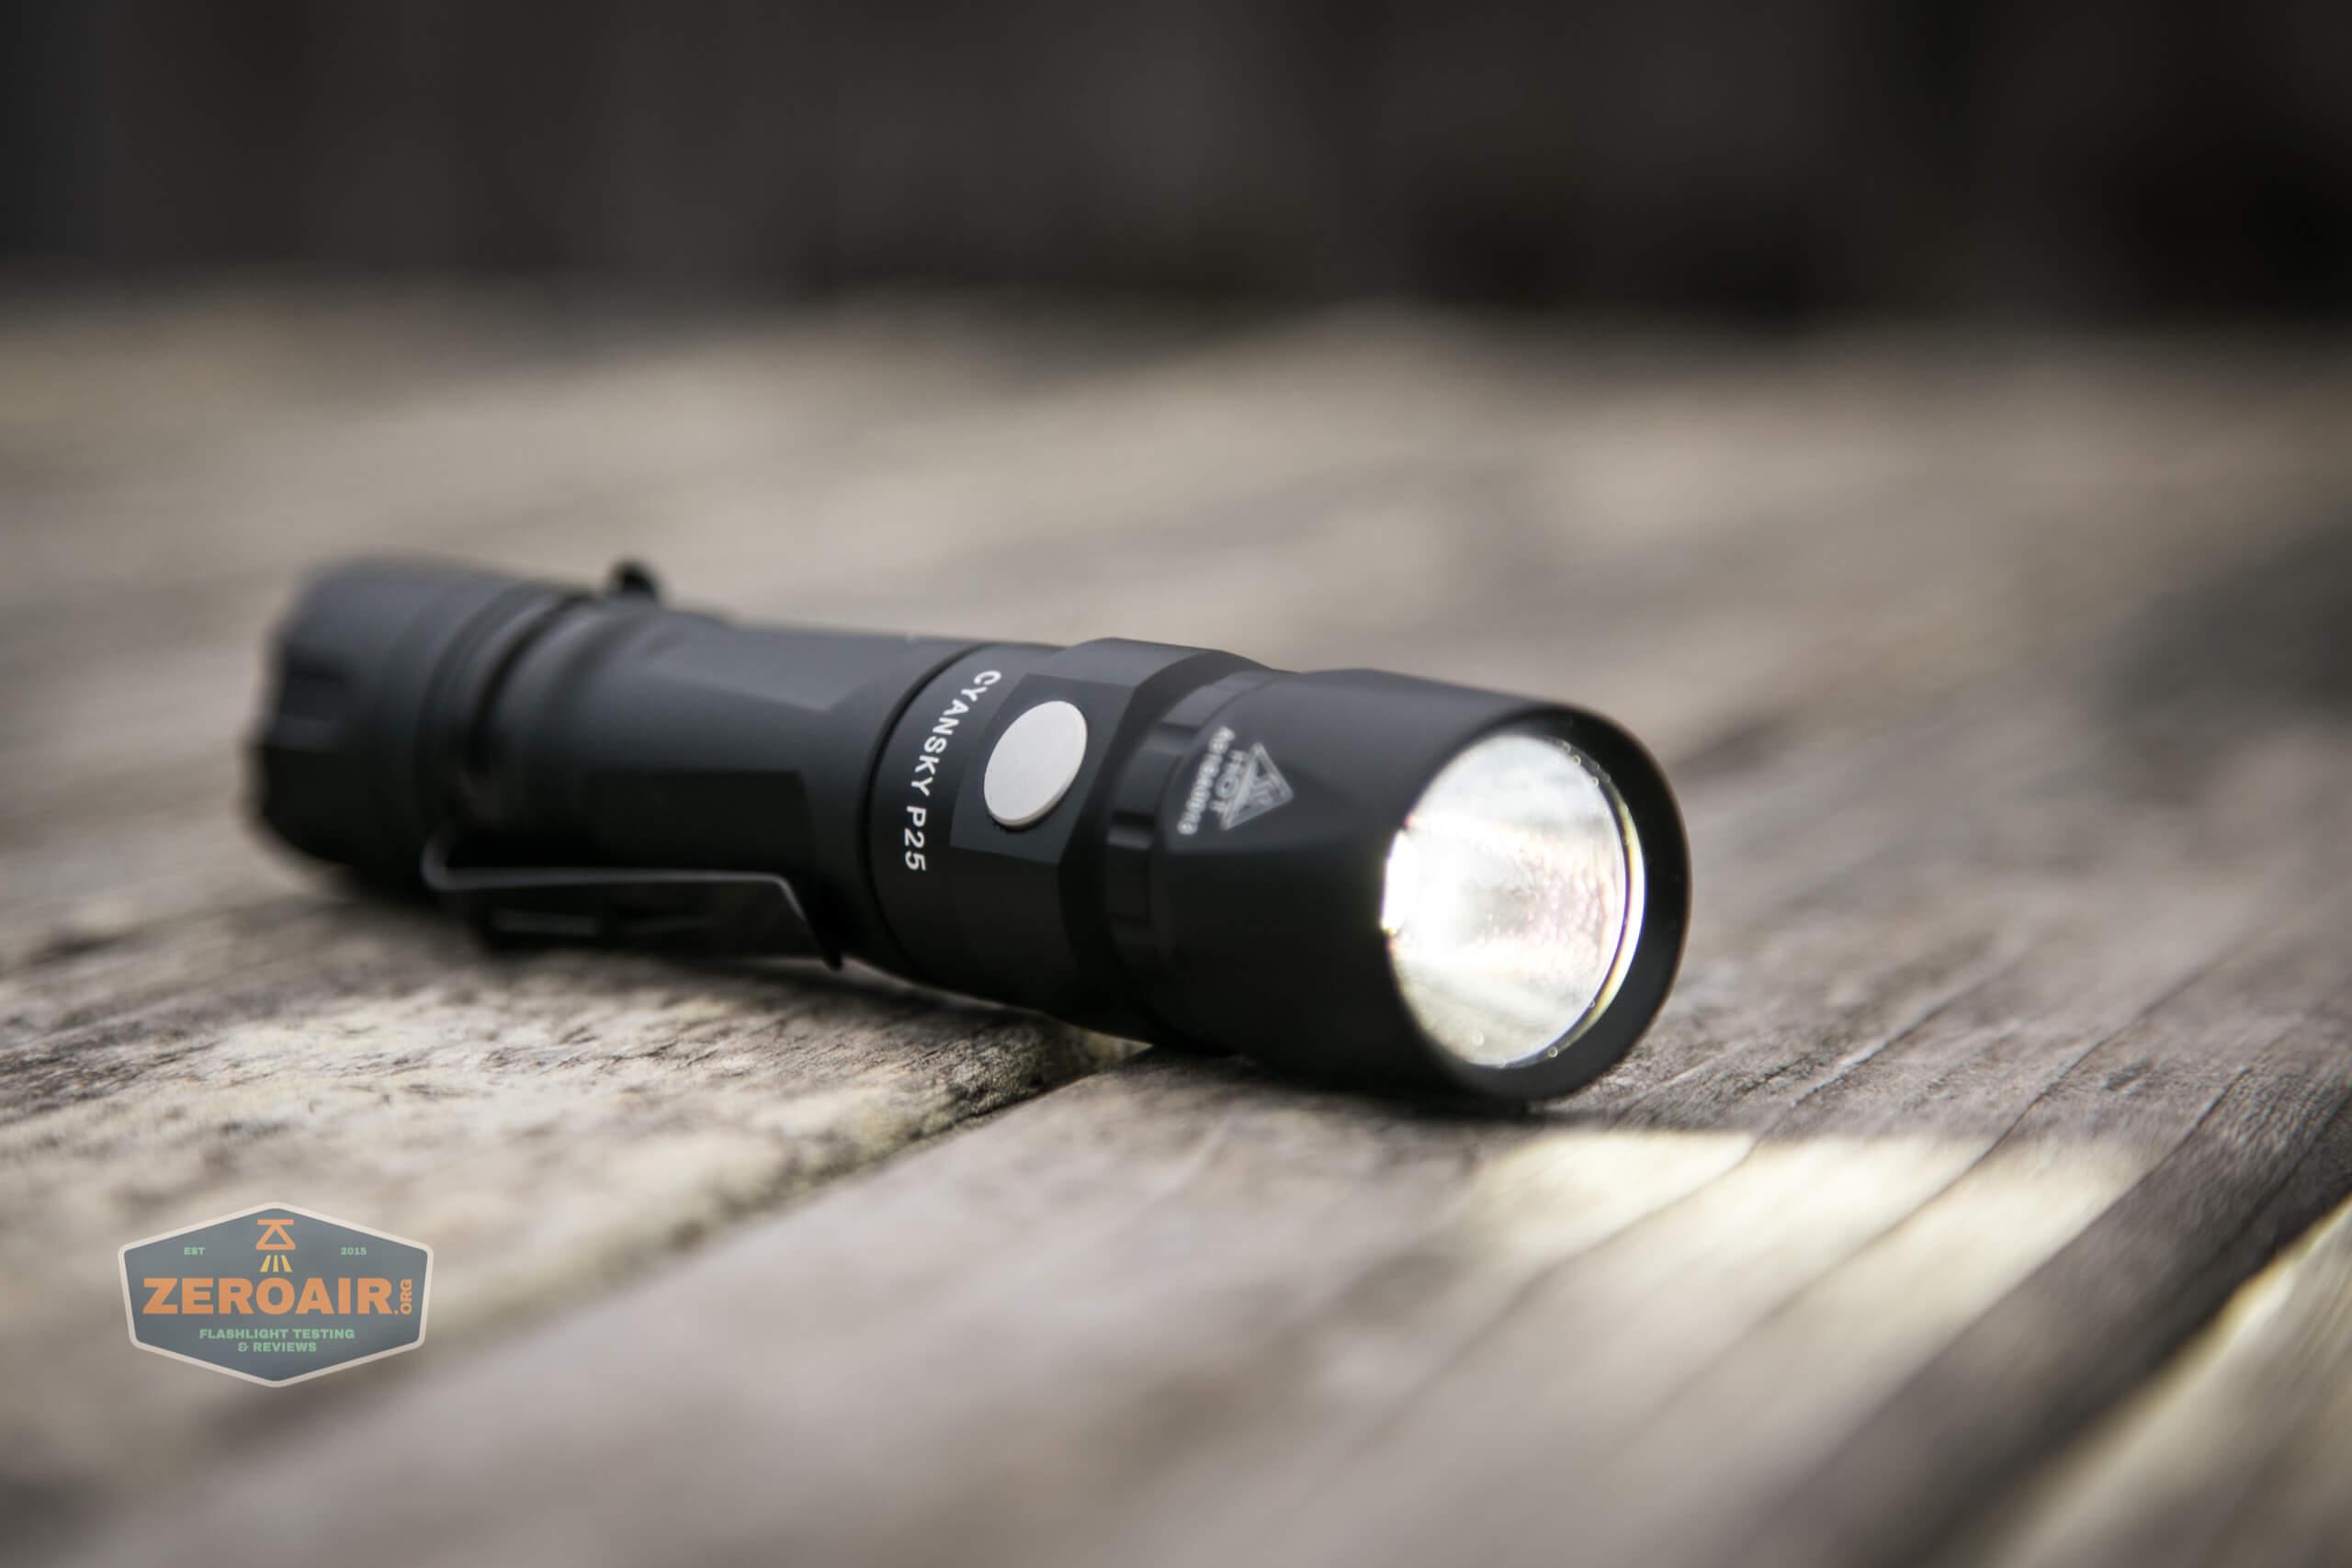 Cyansky P25 Flashlight on